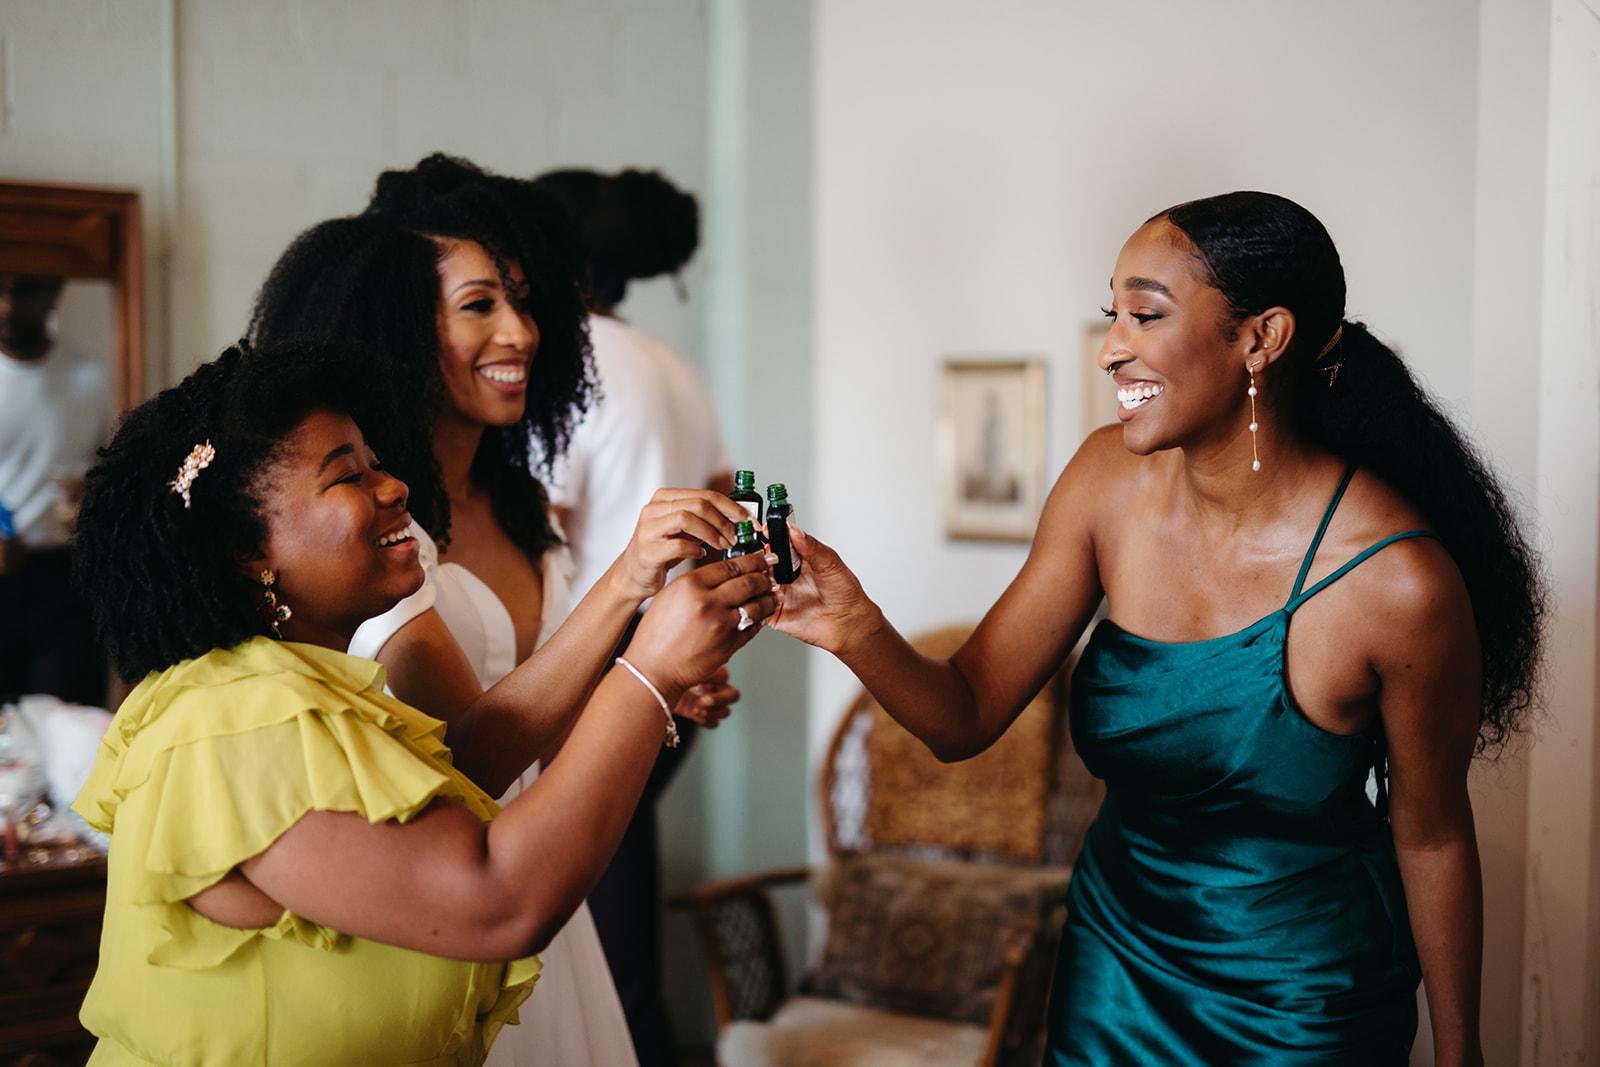 Shawnee Custalow photography lesbian gay same-sex black West Indian wedding USA Dancing With Her magazine